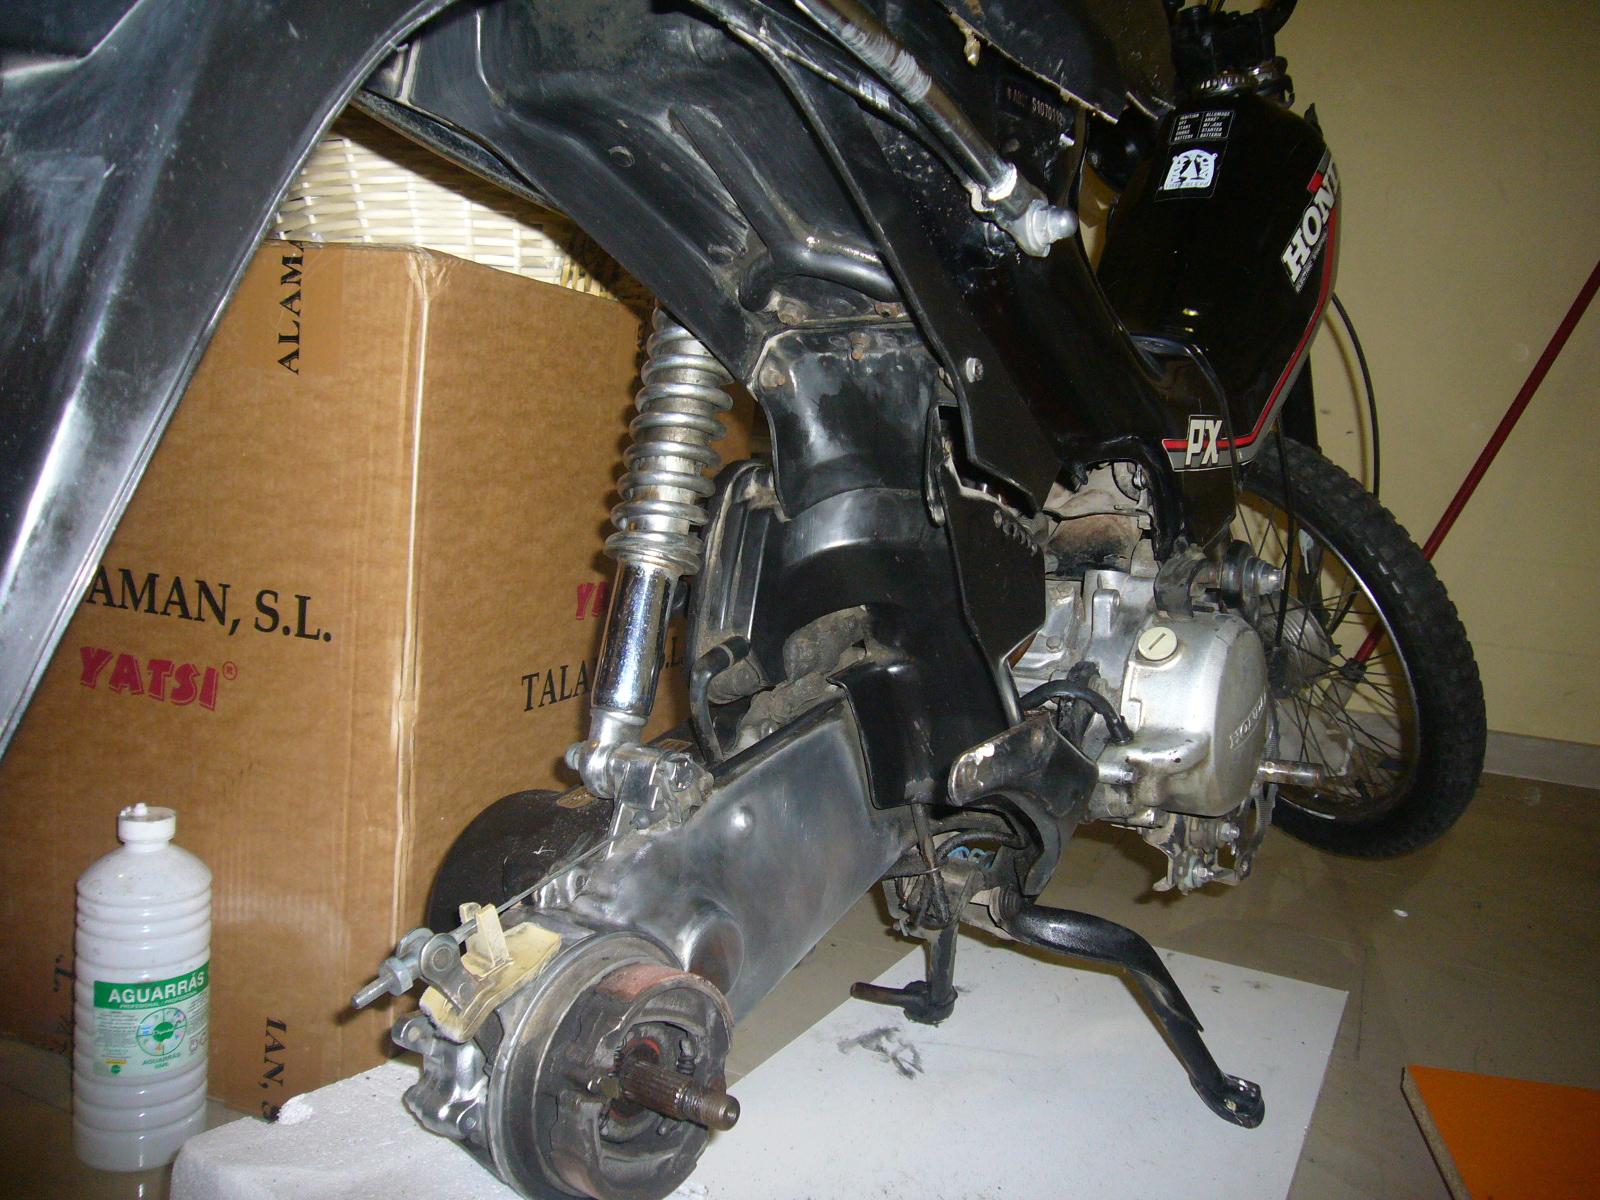 HONDA -  Mi Honda PX '84 - Página 2 8d5ef24b9eea82fe5a6cfcc7f81fce23o